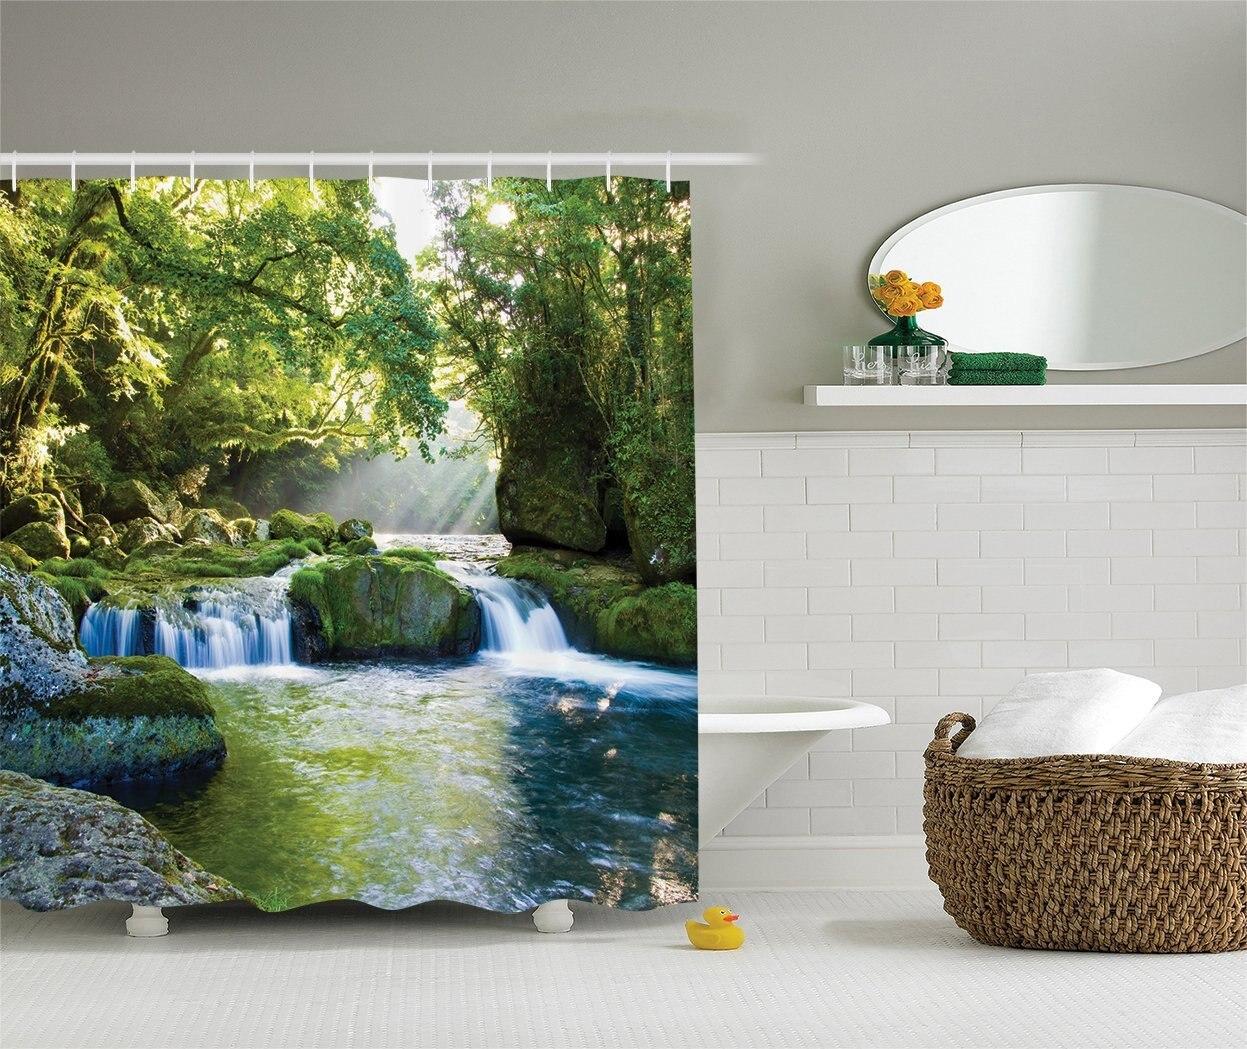 Rainforest shower curtain - Memory Home Rainforest Waterfall Decor Shower Curtain Mountains Mossy Rocks Print Polyester Fabric Bathroom Decor Set